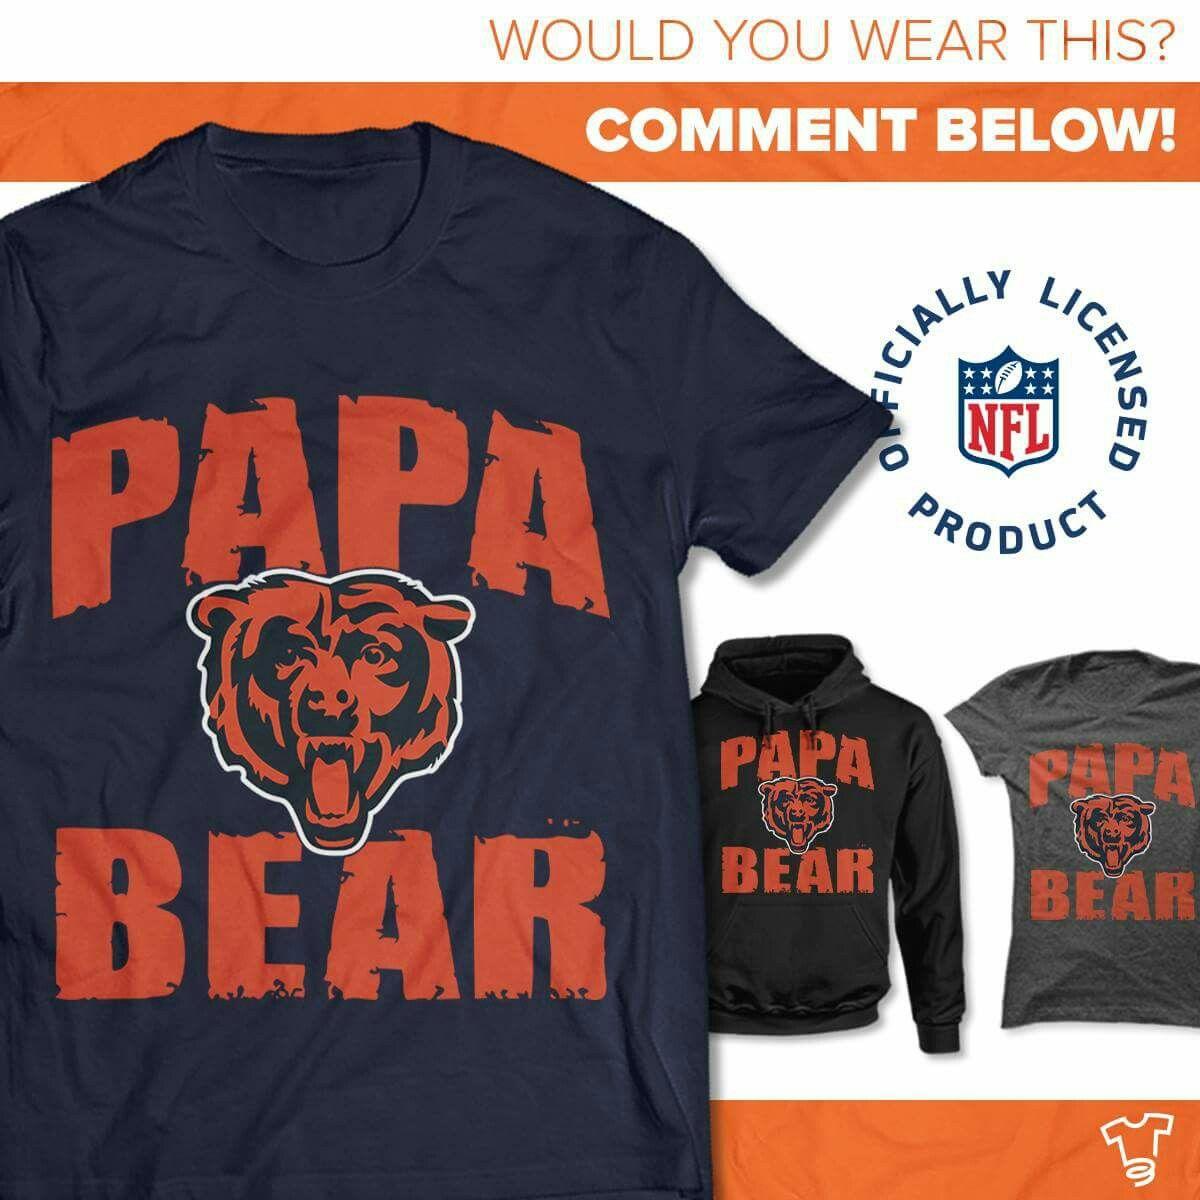 separation shoes 6e200 42207 Papa Bear tshirt | Chicago Bears - Apparel | Bear, T shirt ...